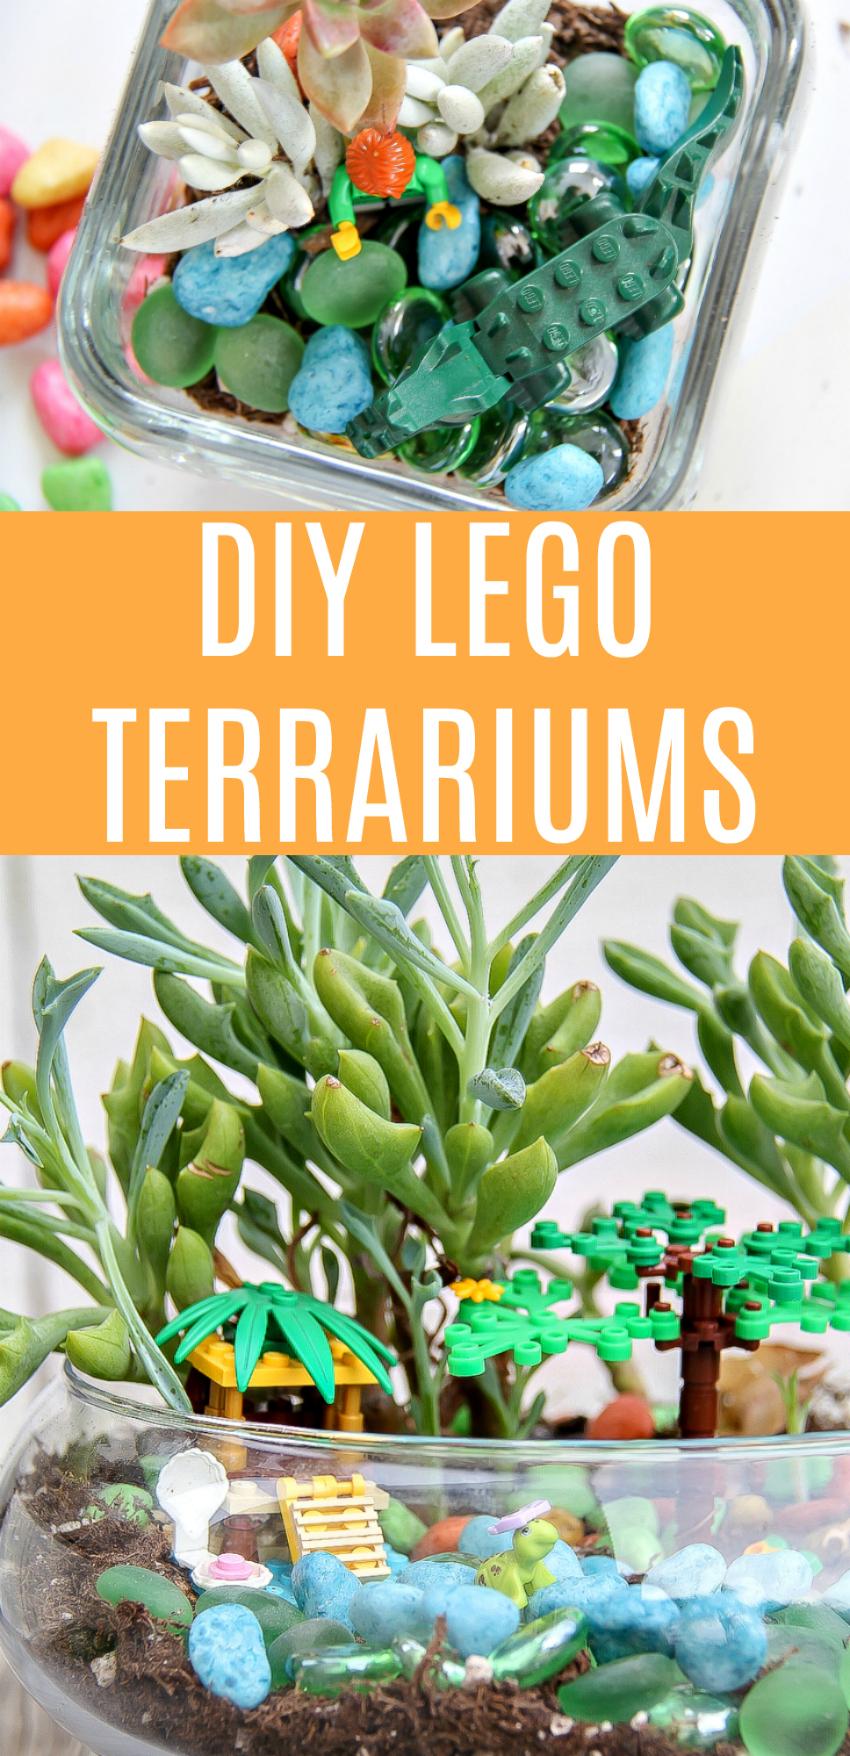 DIY LEGO Terrariums Kids Craft